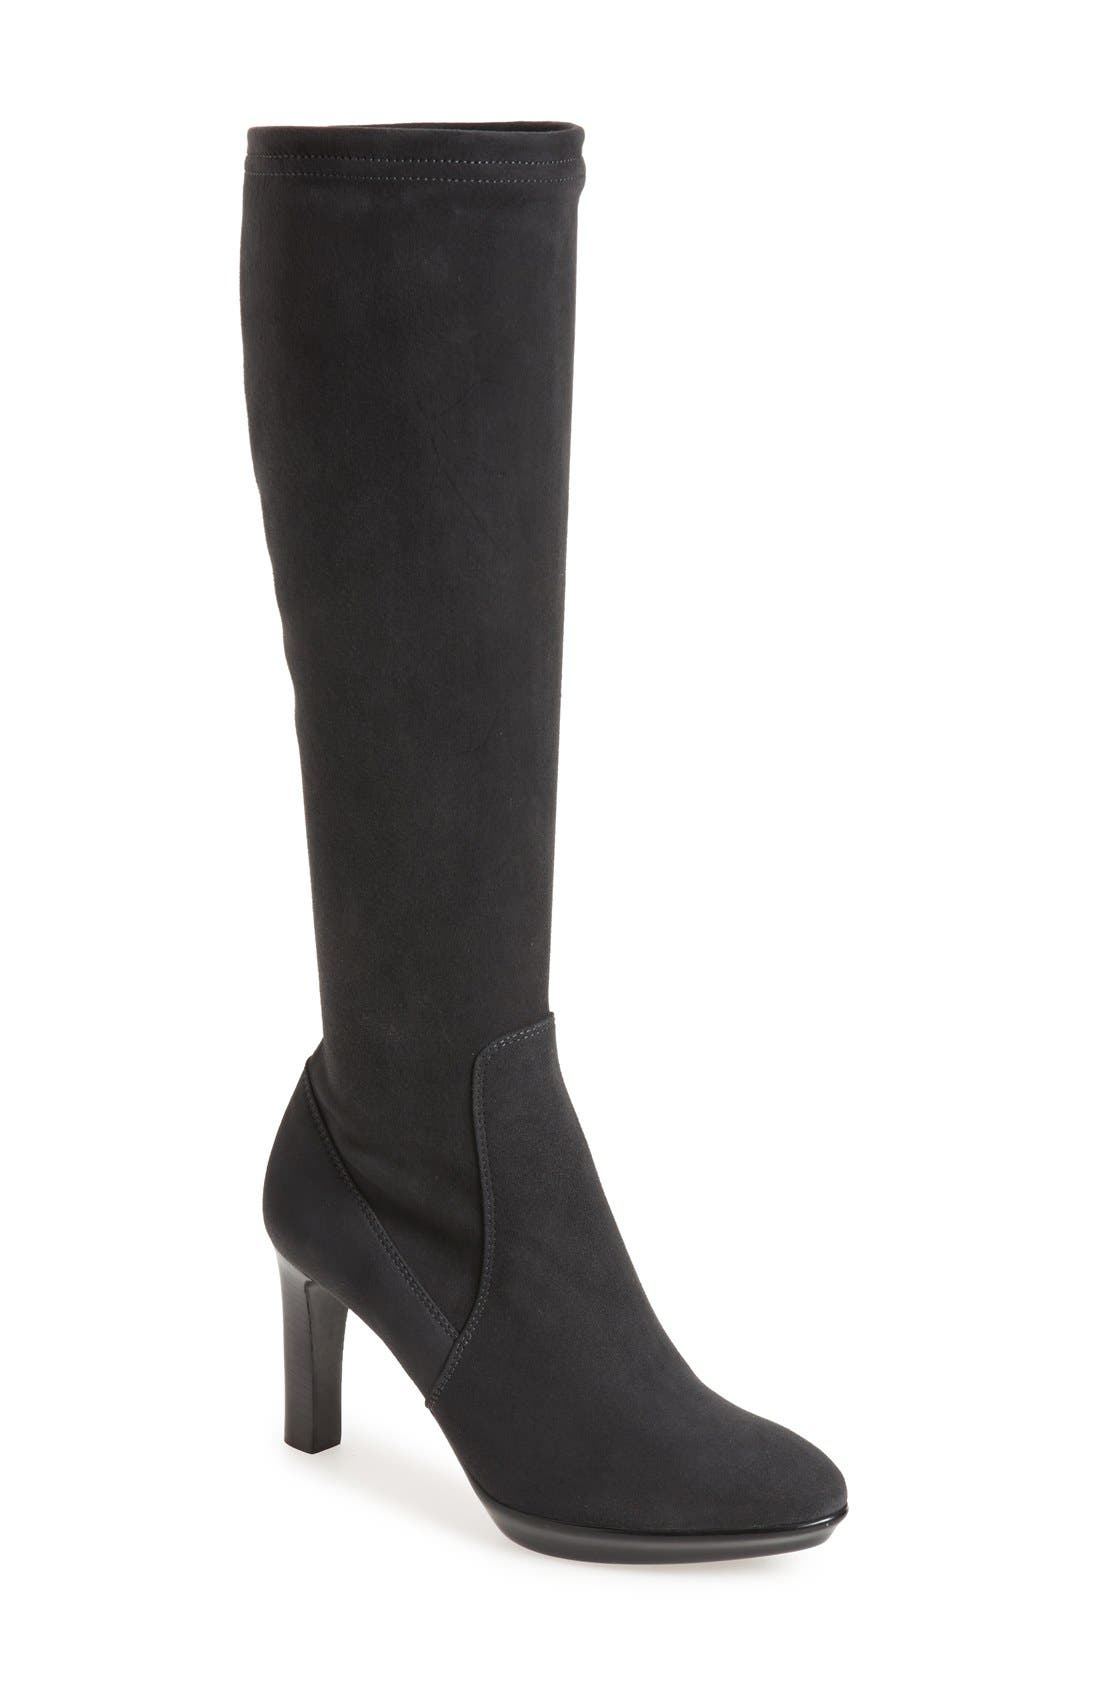 Main Image - Aquatalia 'Rumbah' Weatherproof Knee High Stretch Boot (Women)